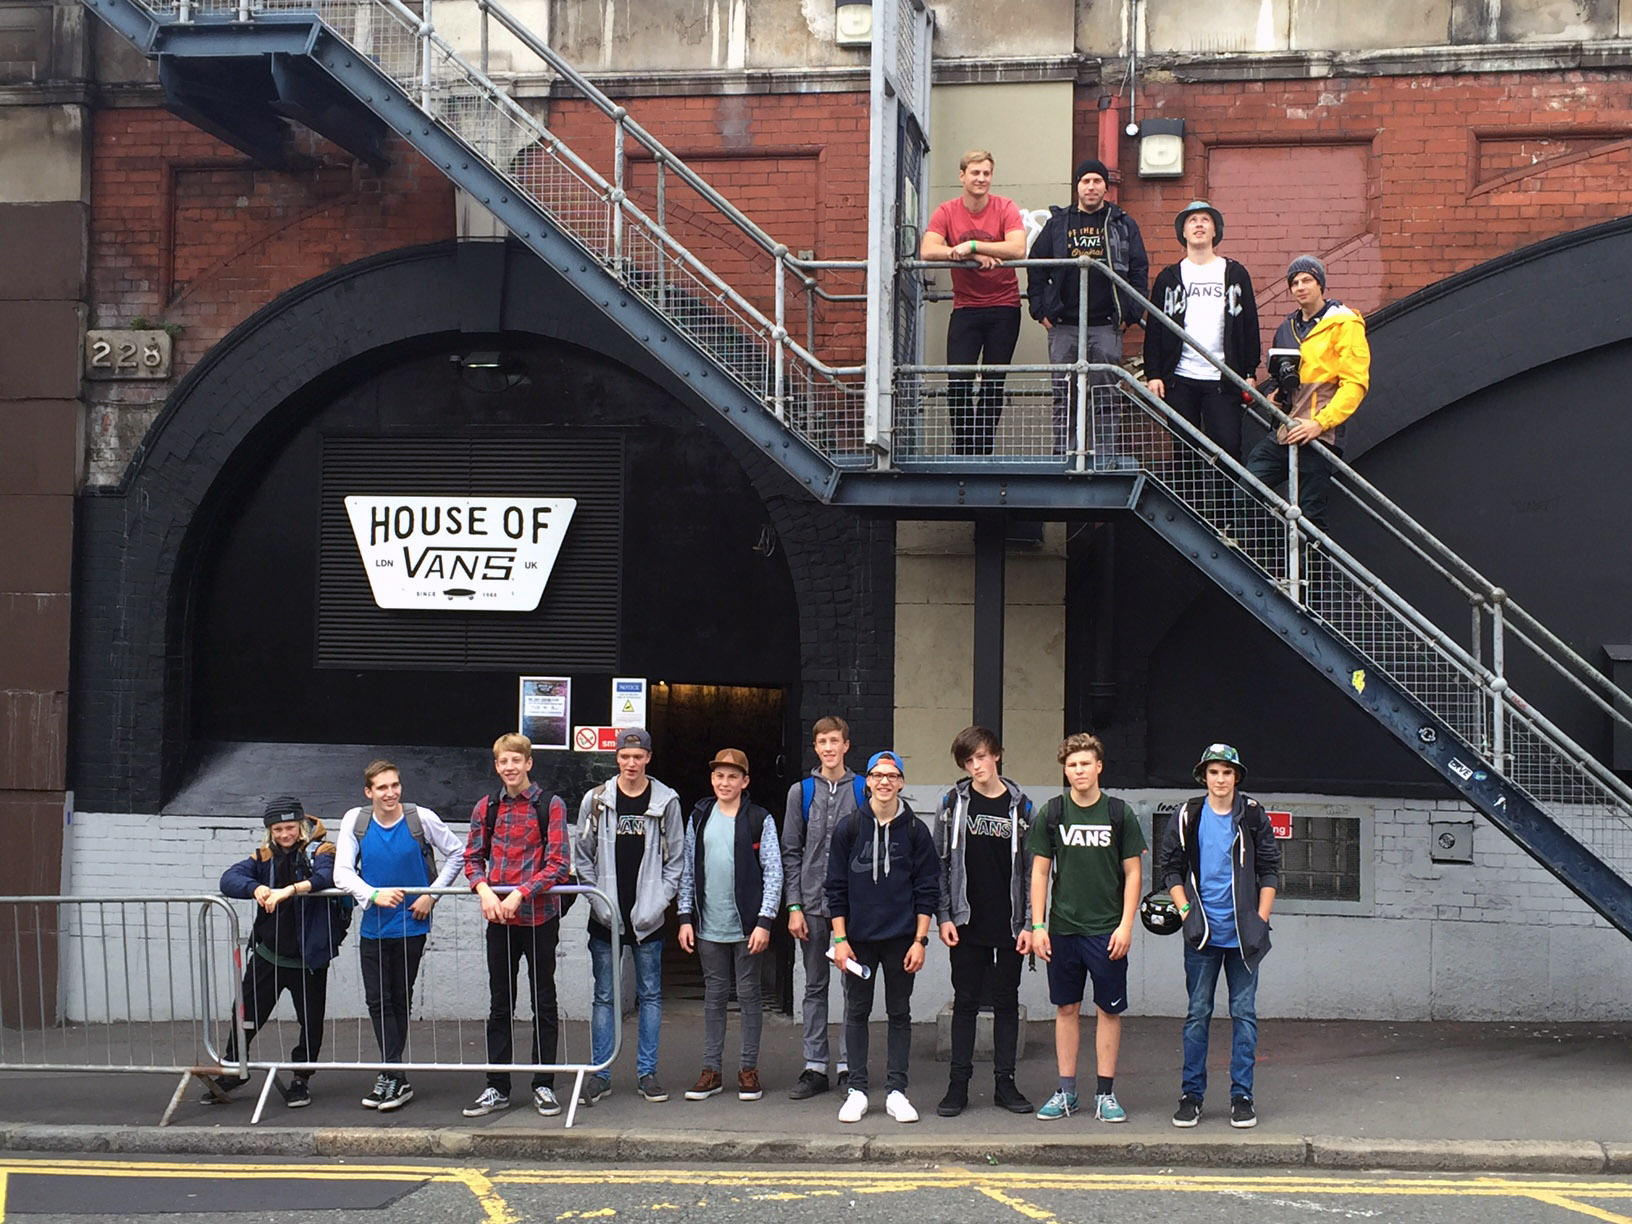 Die Delegation der Sportpiraten vor dem House of Vans in London